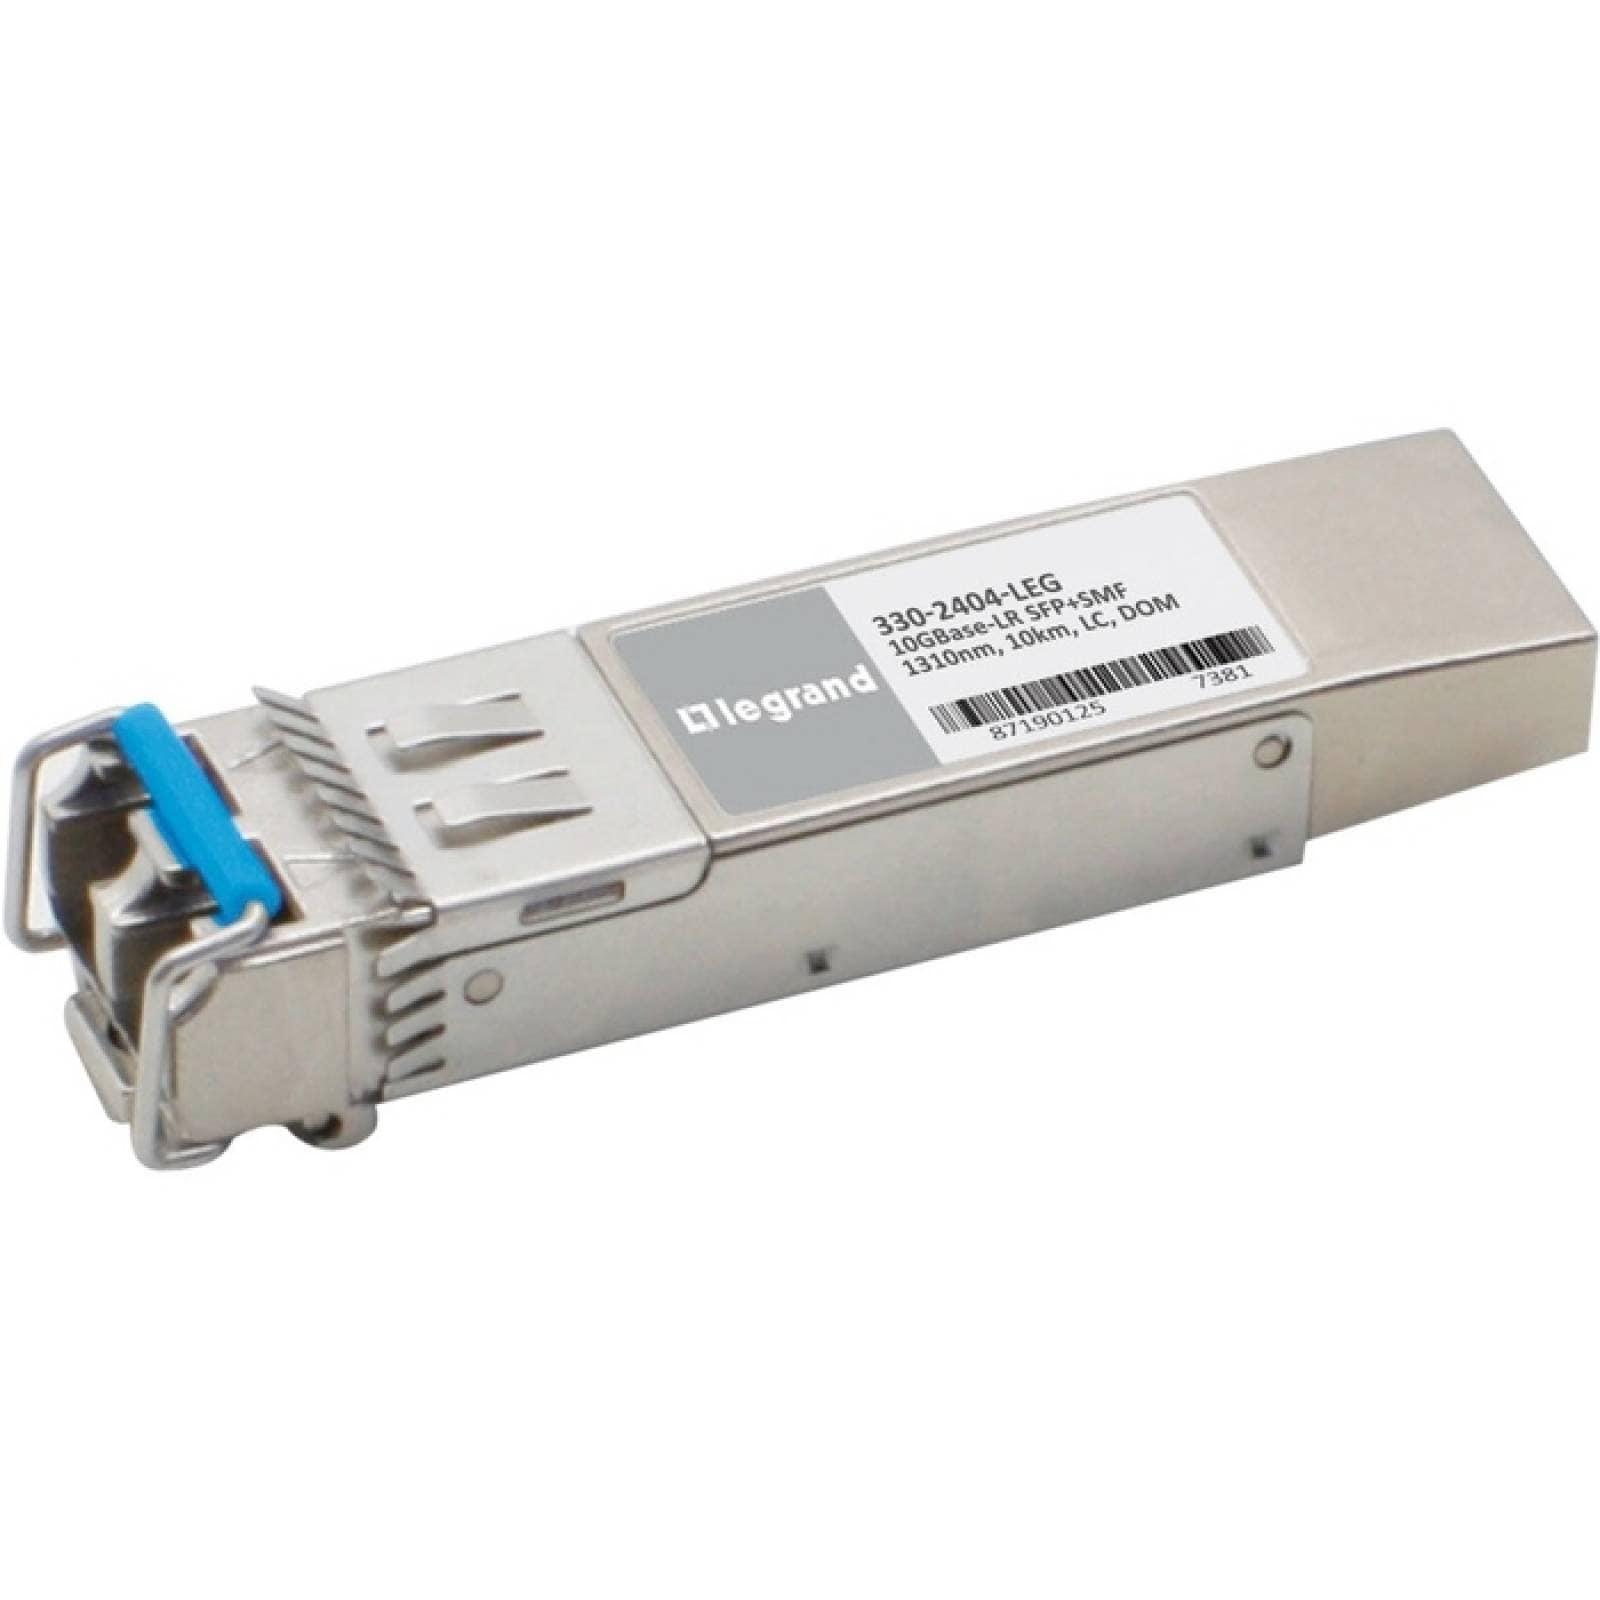 Legrand Dell 3302404 10GBaseLR SFP  Transceptor TAA